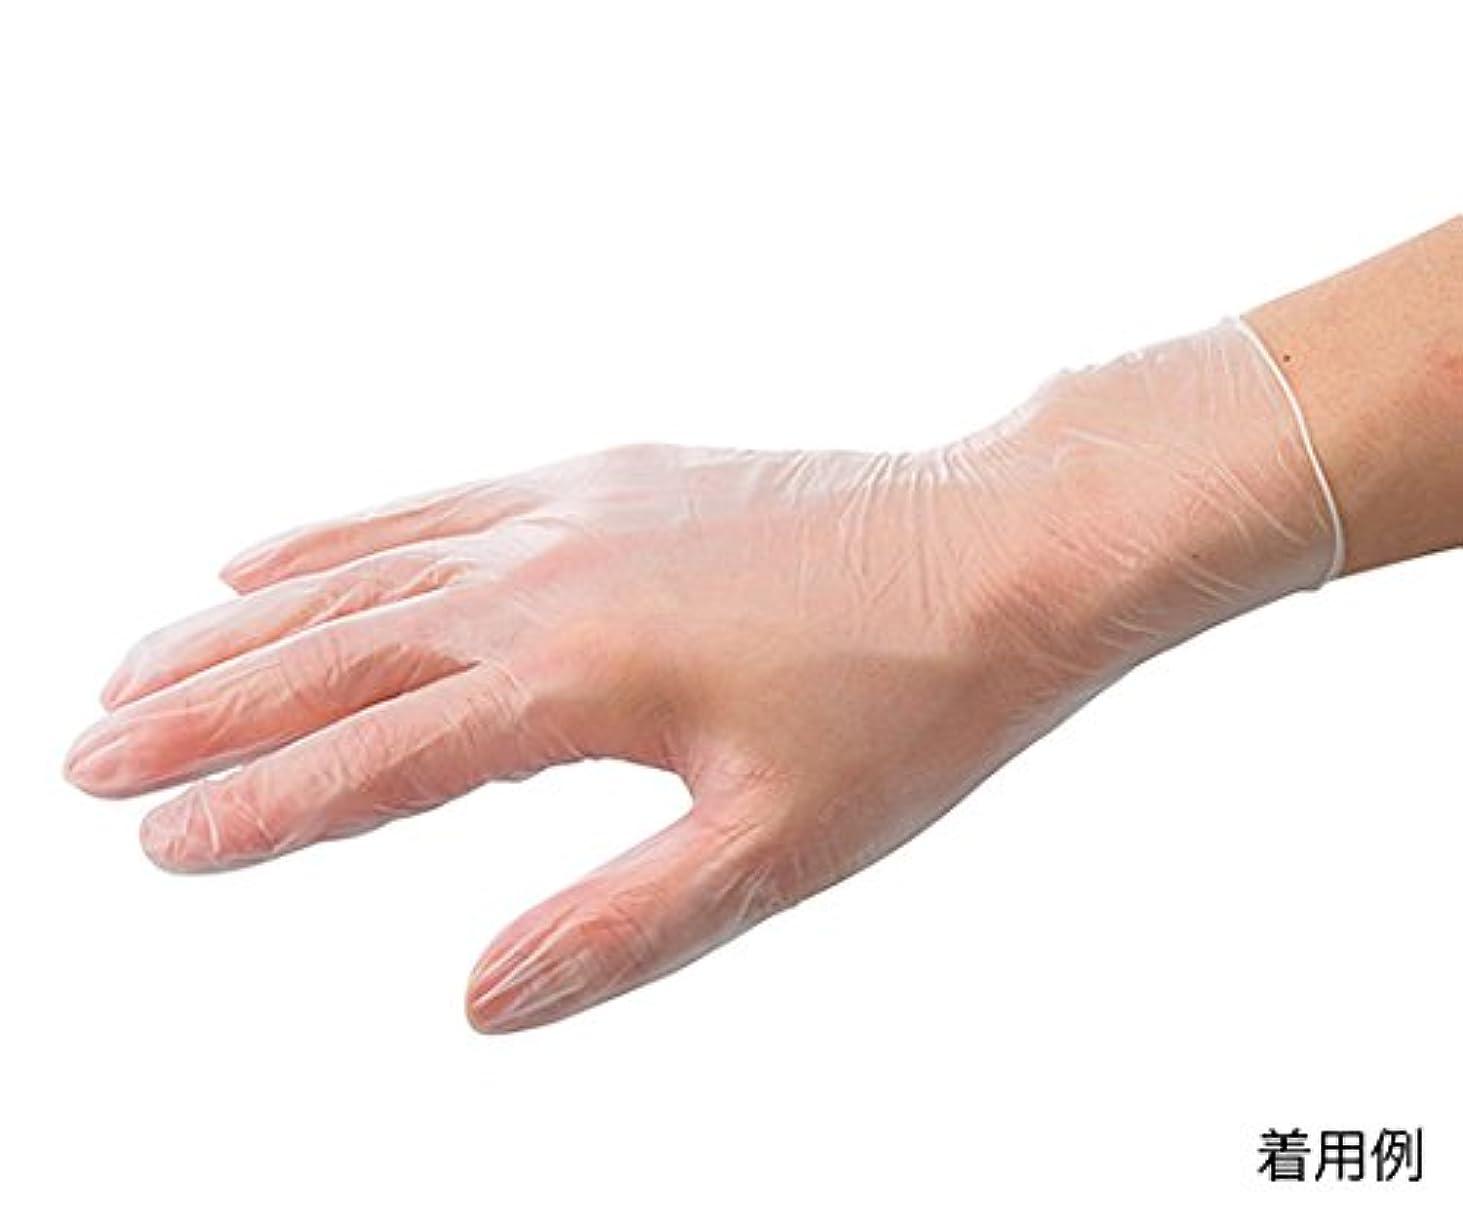 ARメディコム?インク?アジアリミテッド7-3727-03バイタルプラスチック手袋(パウダー付き)L150枚入